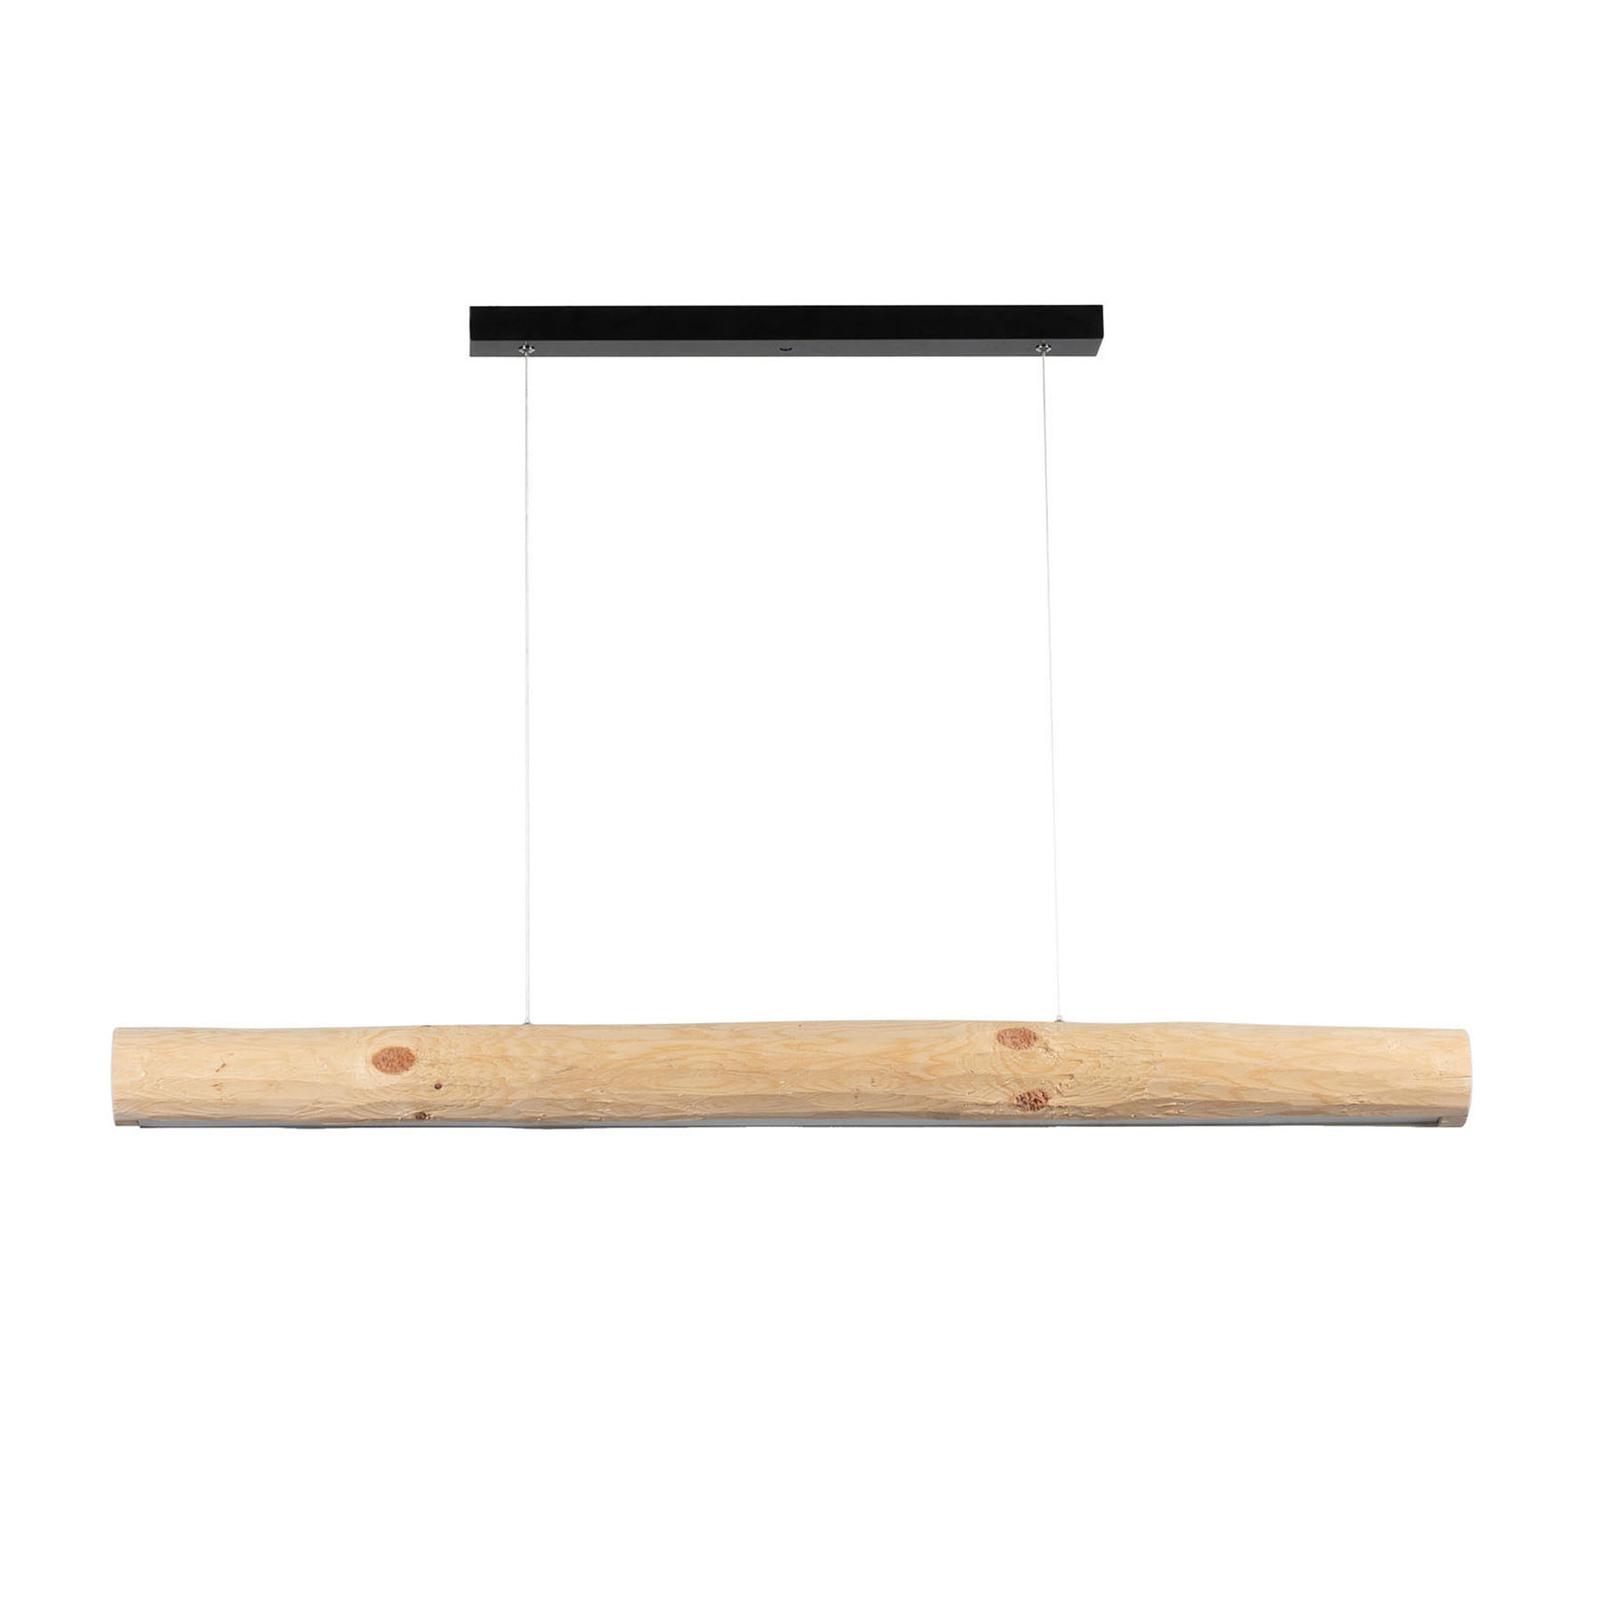 Lampa wisząca Lucas drewno sosnowe naturalne 115cm